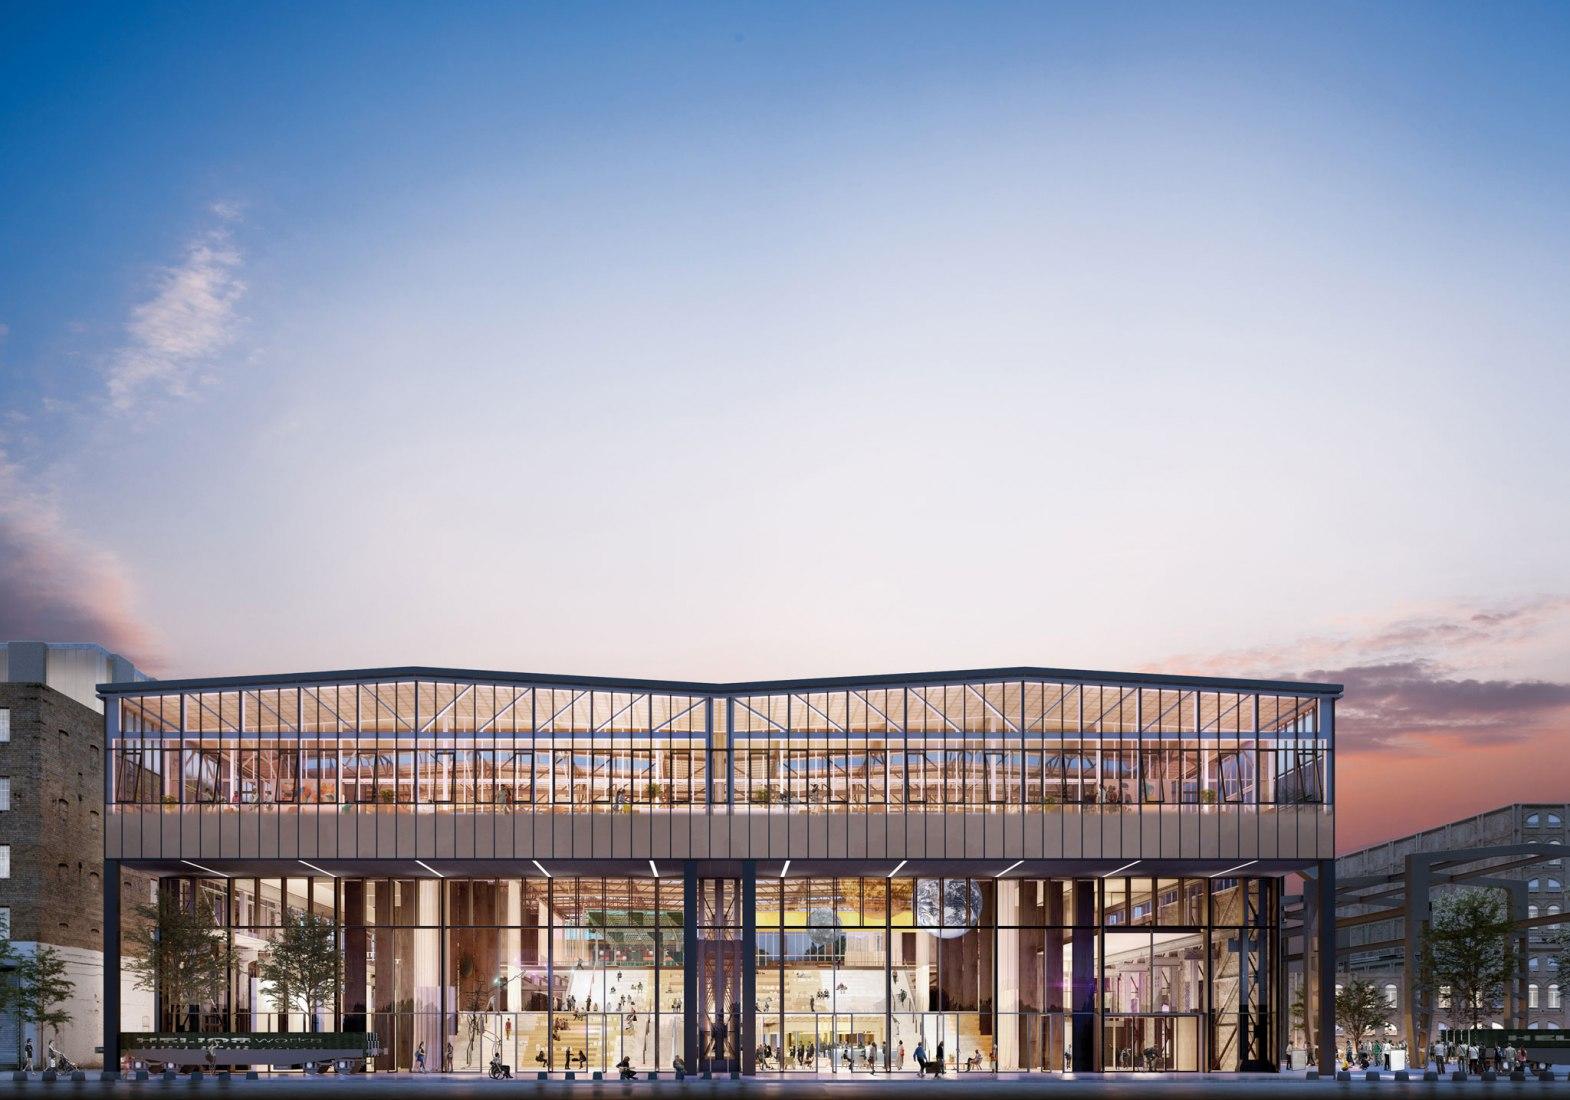 LocHal por CIVIC Architects. Imagen cortesía de CIVIC Architects